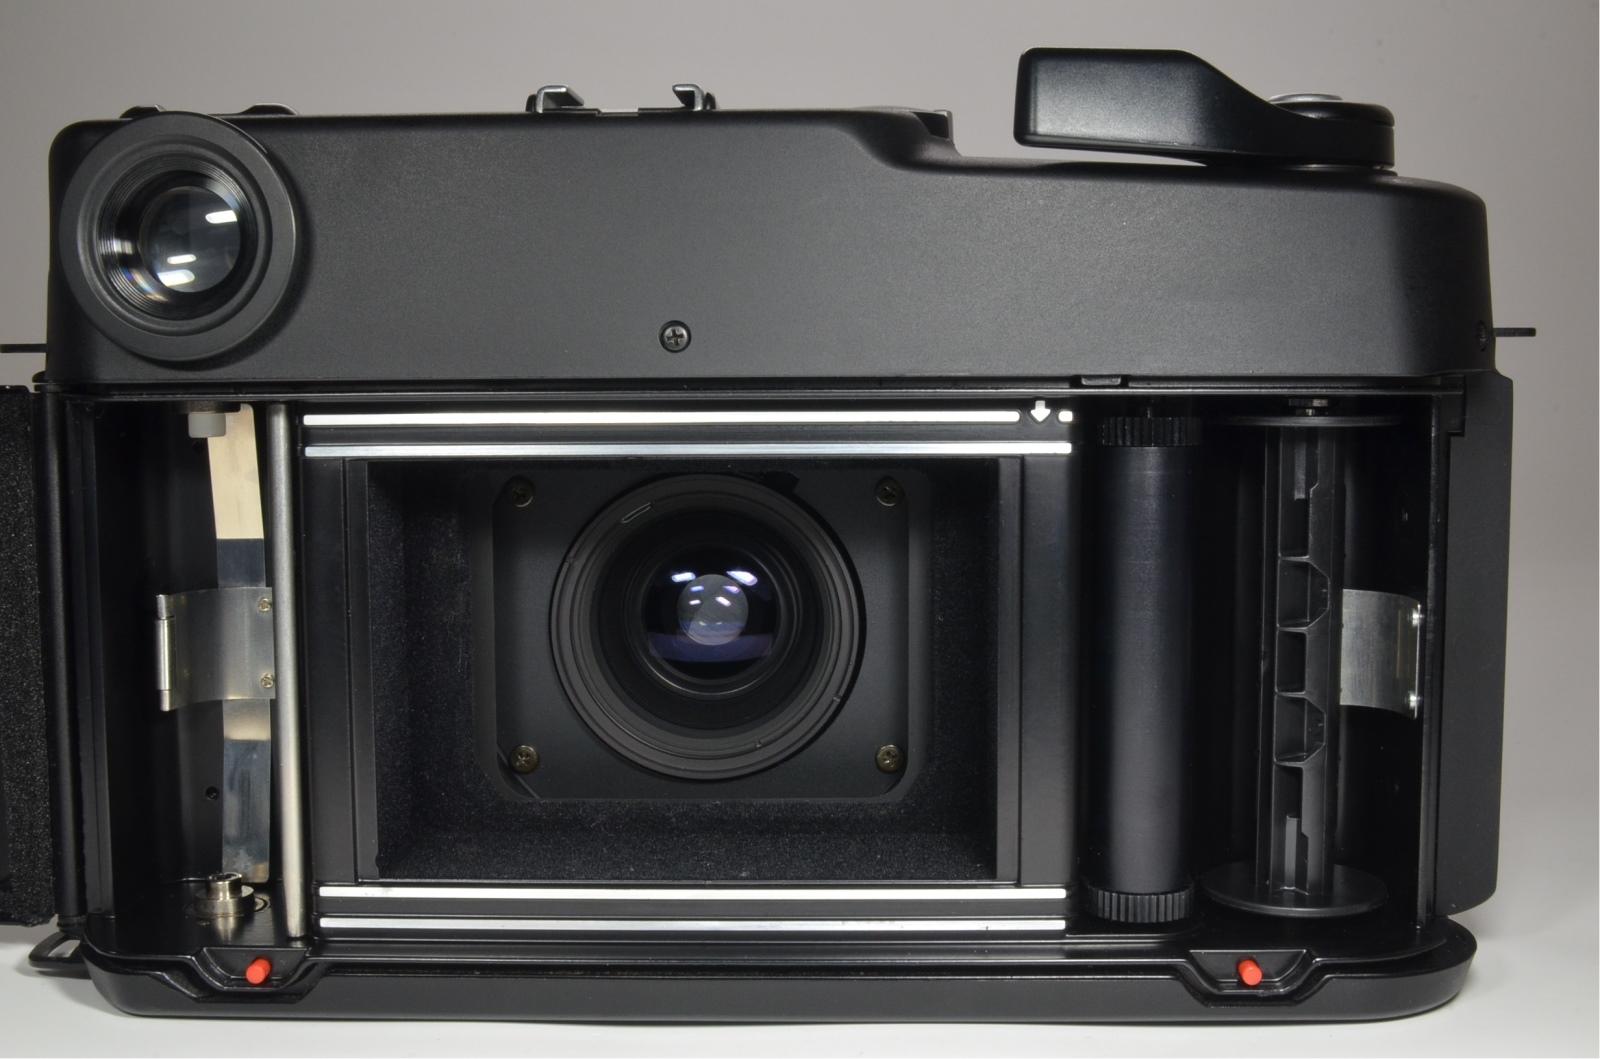 fuji fujifilm gsw690iii professional ebc 65mm f5.6 count '029' rare!